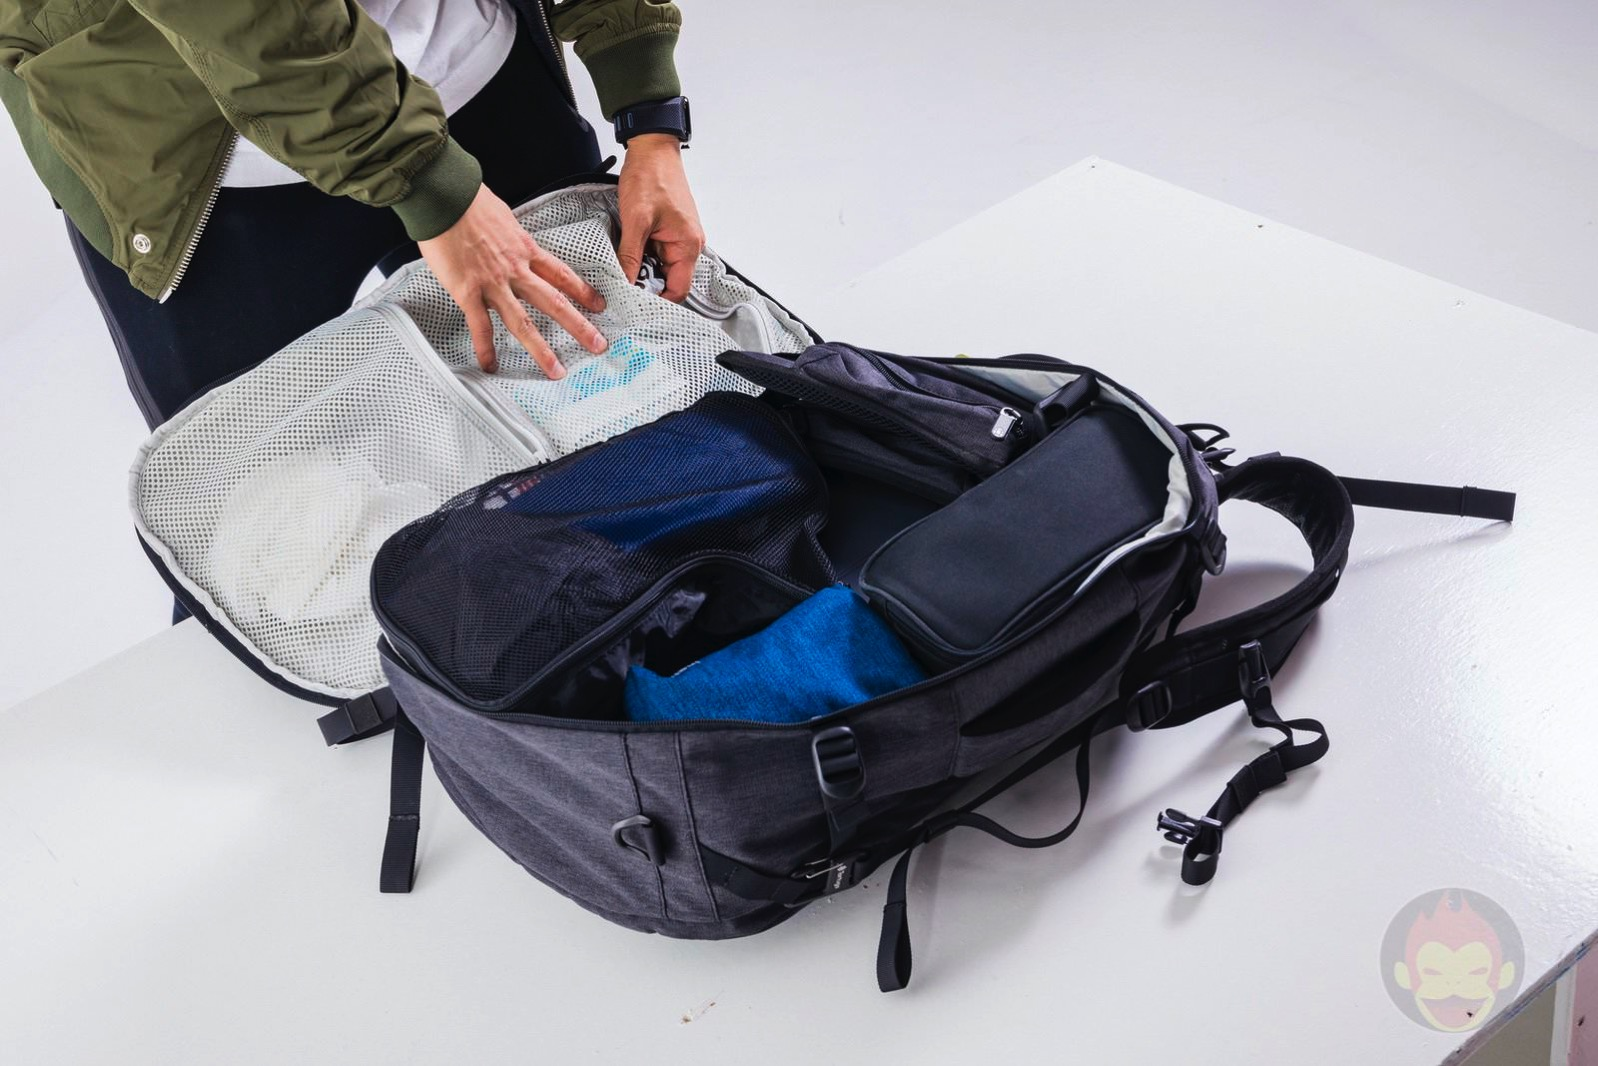 Tortuga-Setout-Backpack-35liter-review-25.jpg